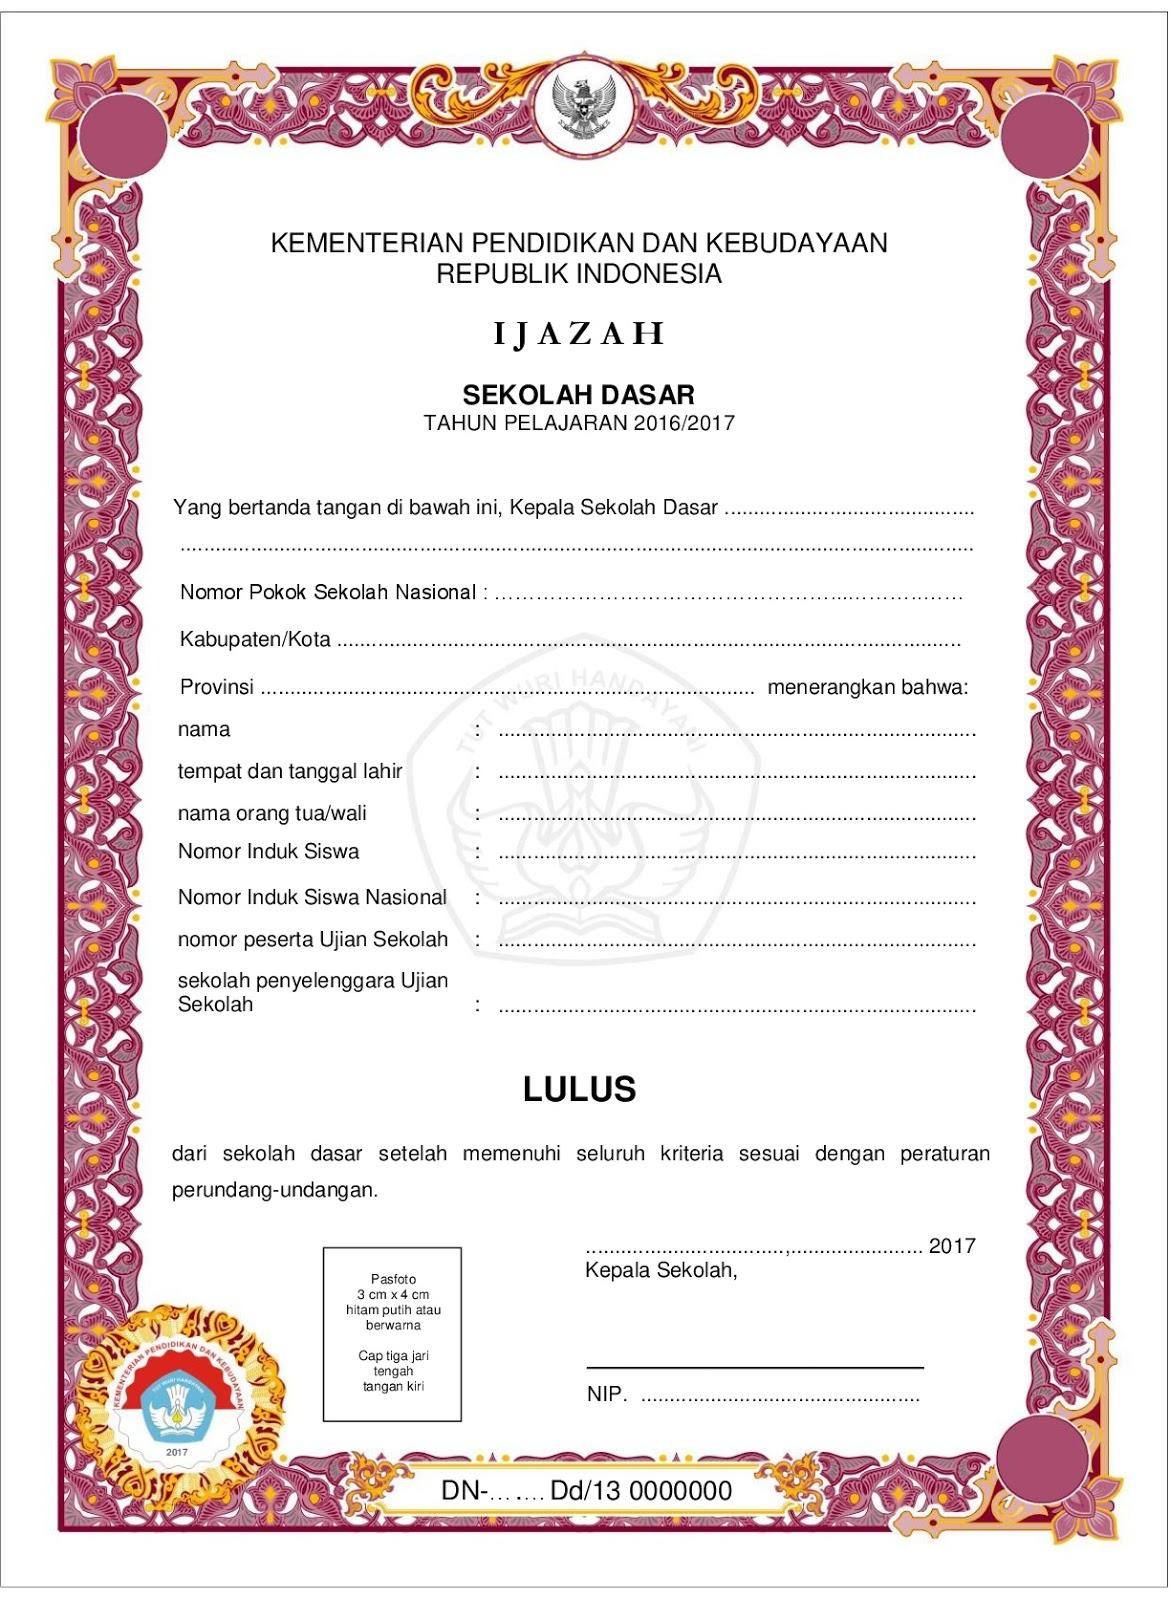 Download Contoh Blangko Ijazah Sd Tahun 2017 Sidapodik